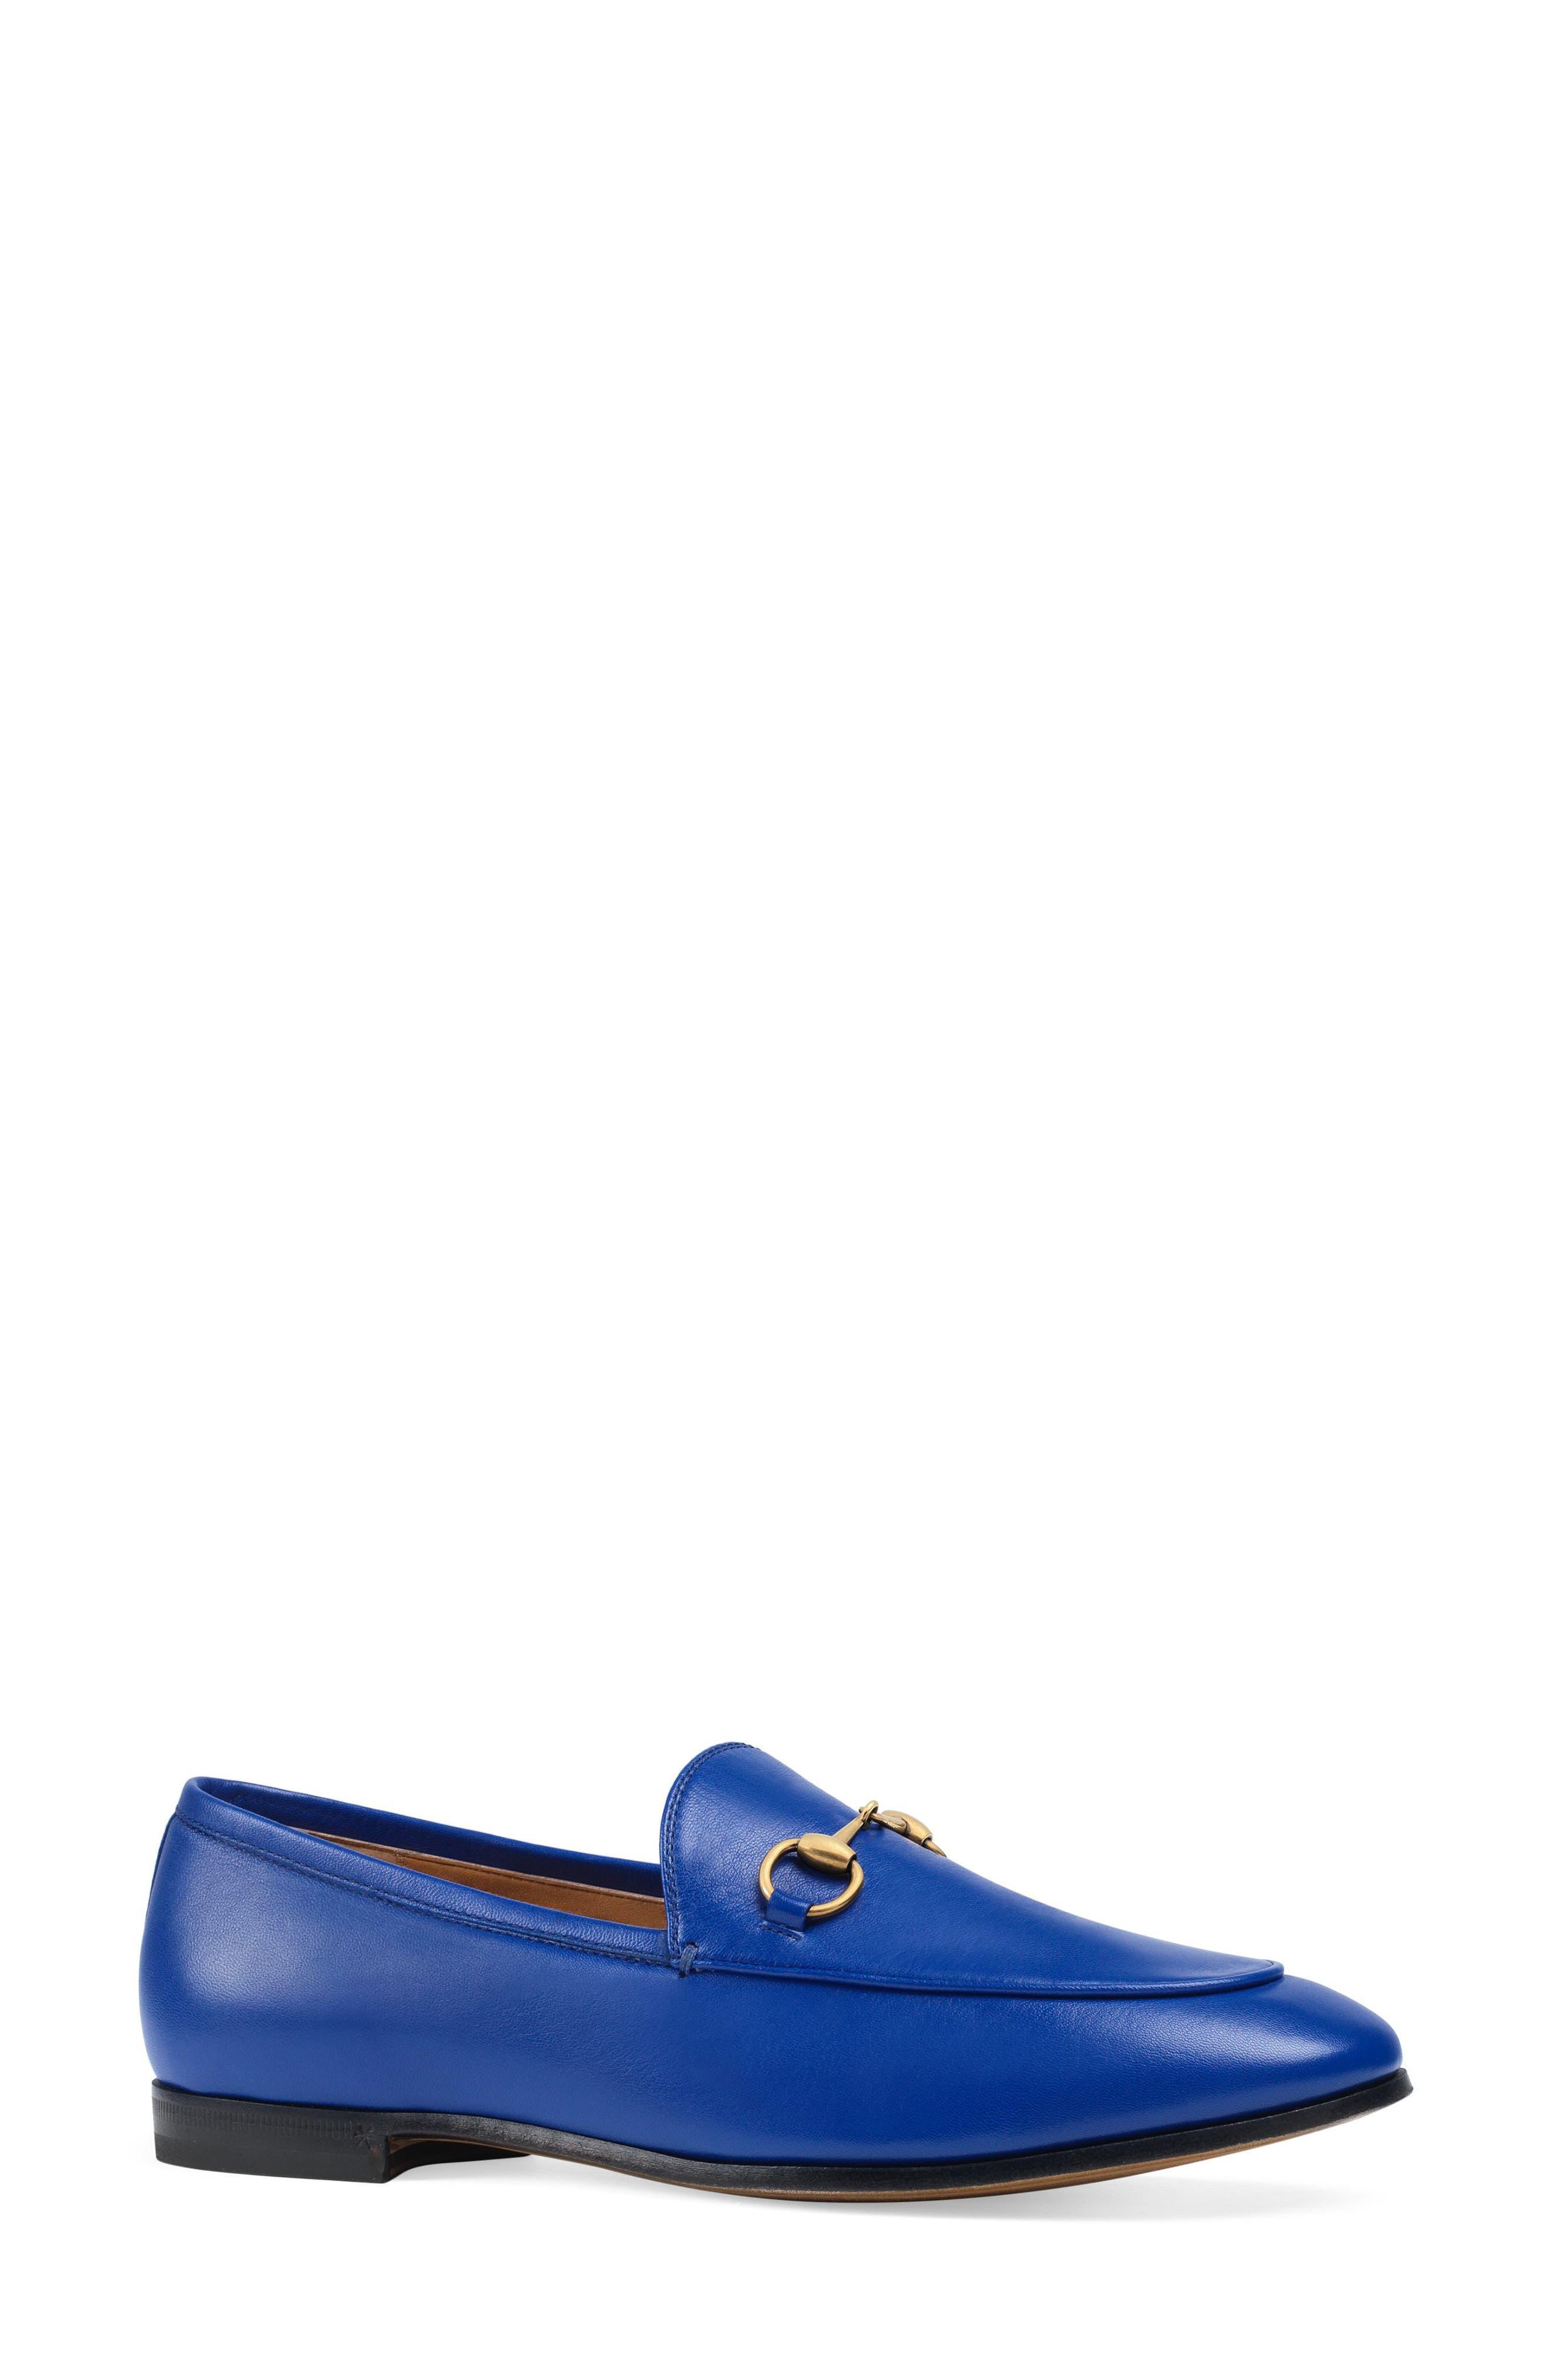 Main Image - Gucci 'Jordaan' Loafer (Women)